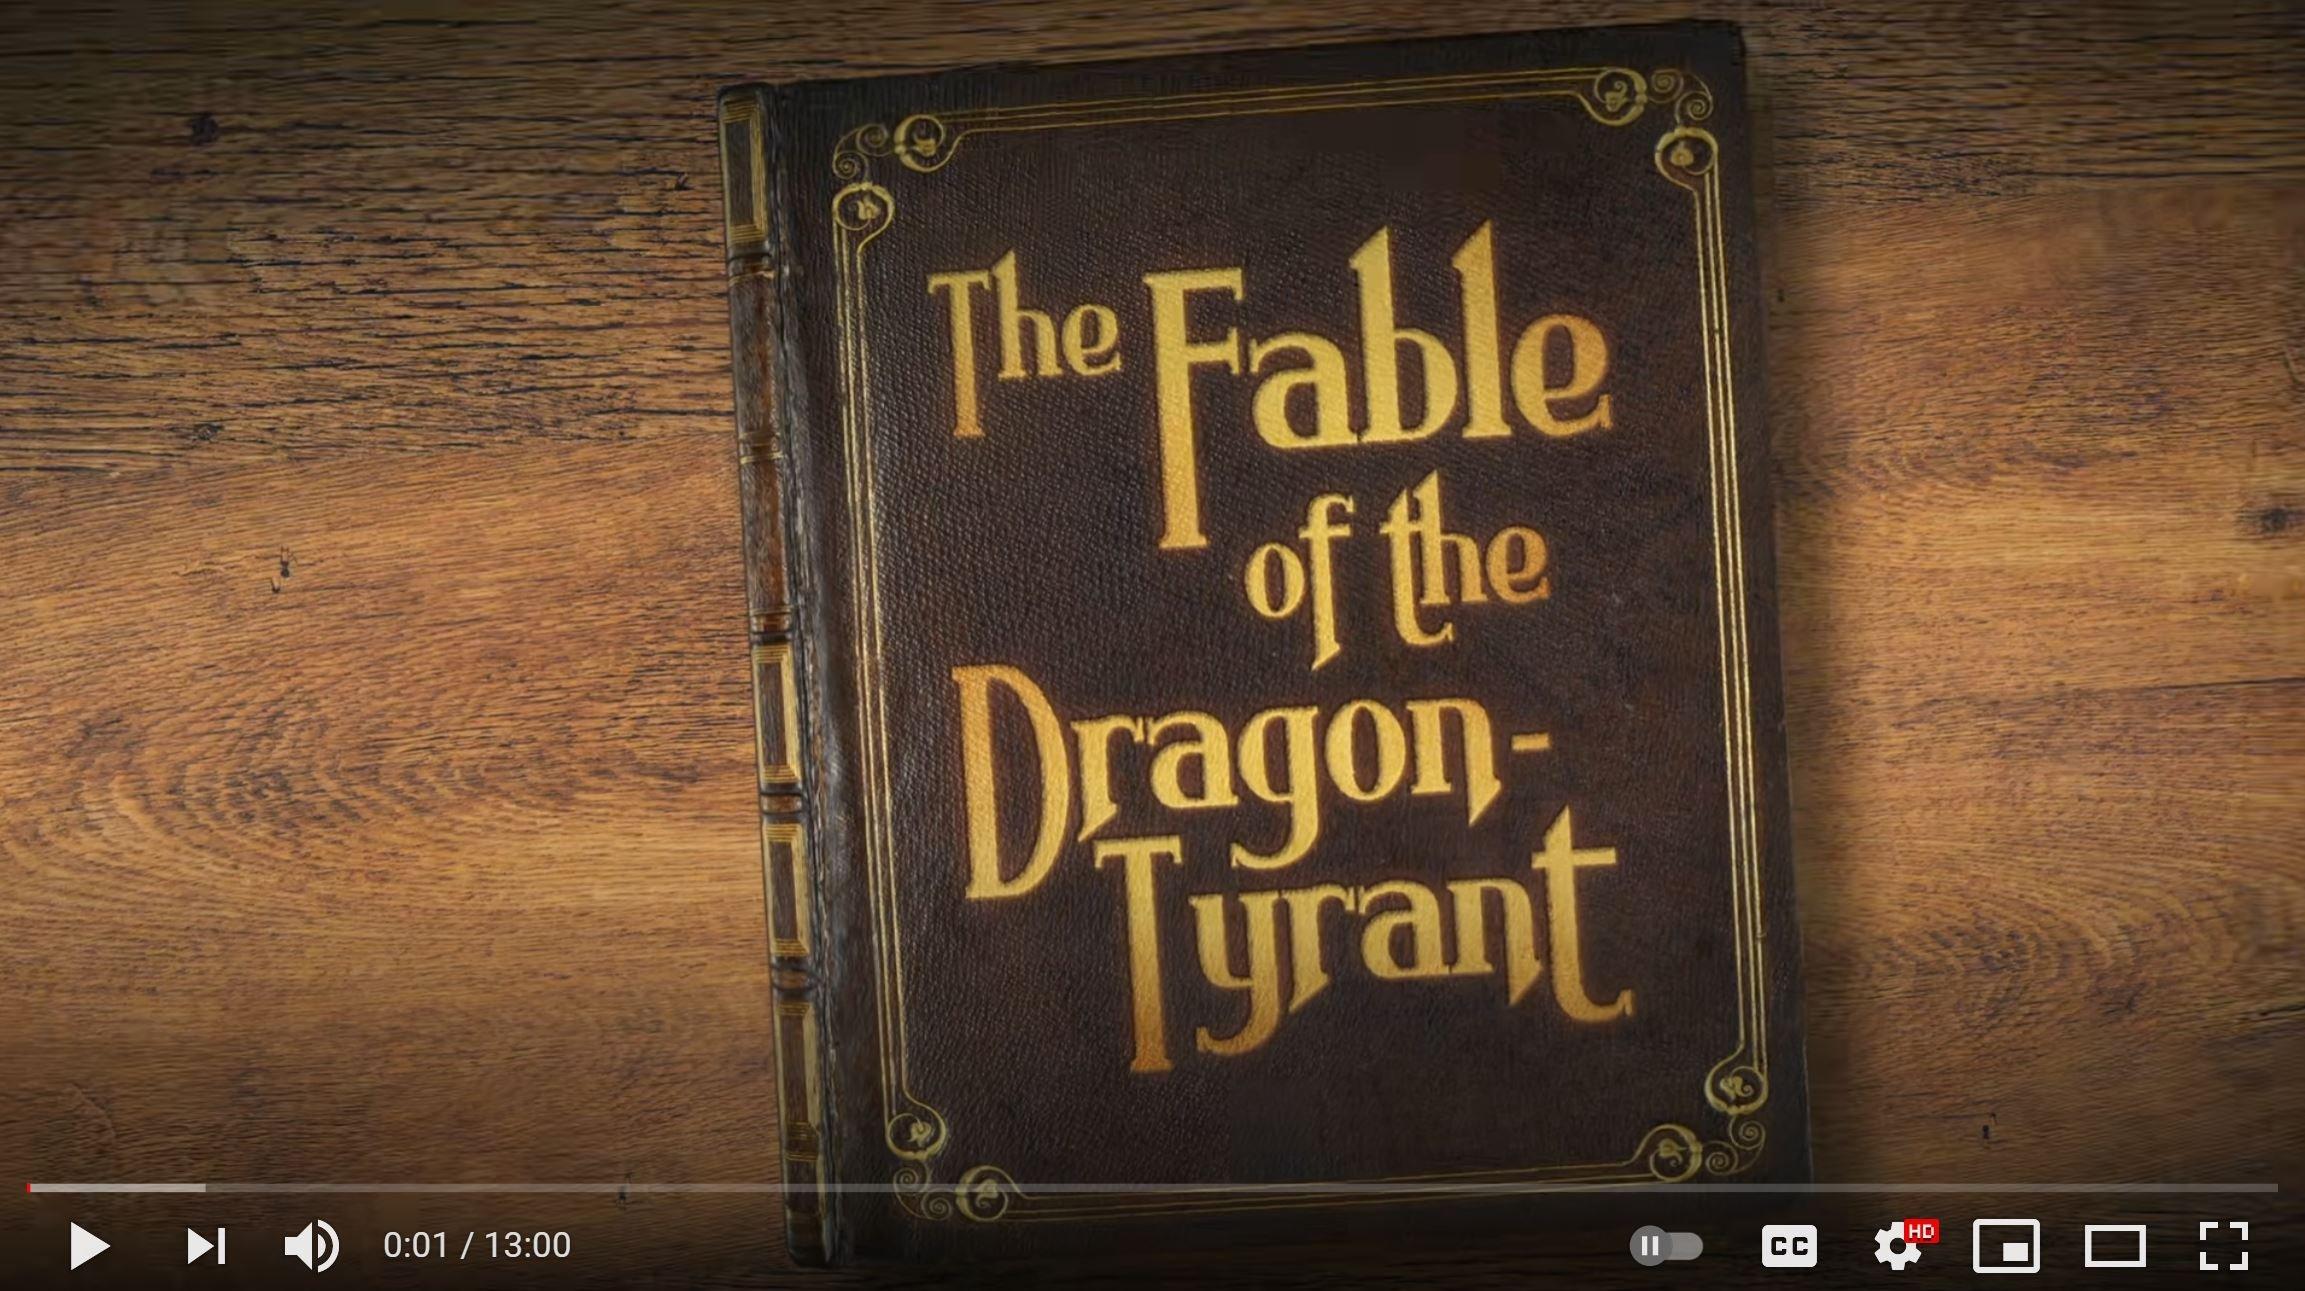 CGP Grey - The Fable of the Dragon-tyrant